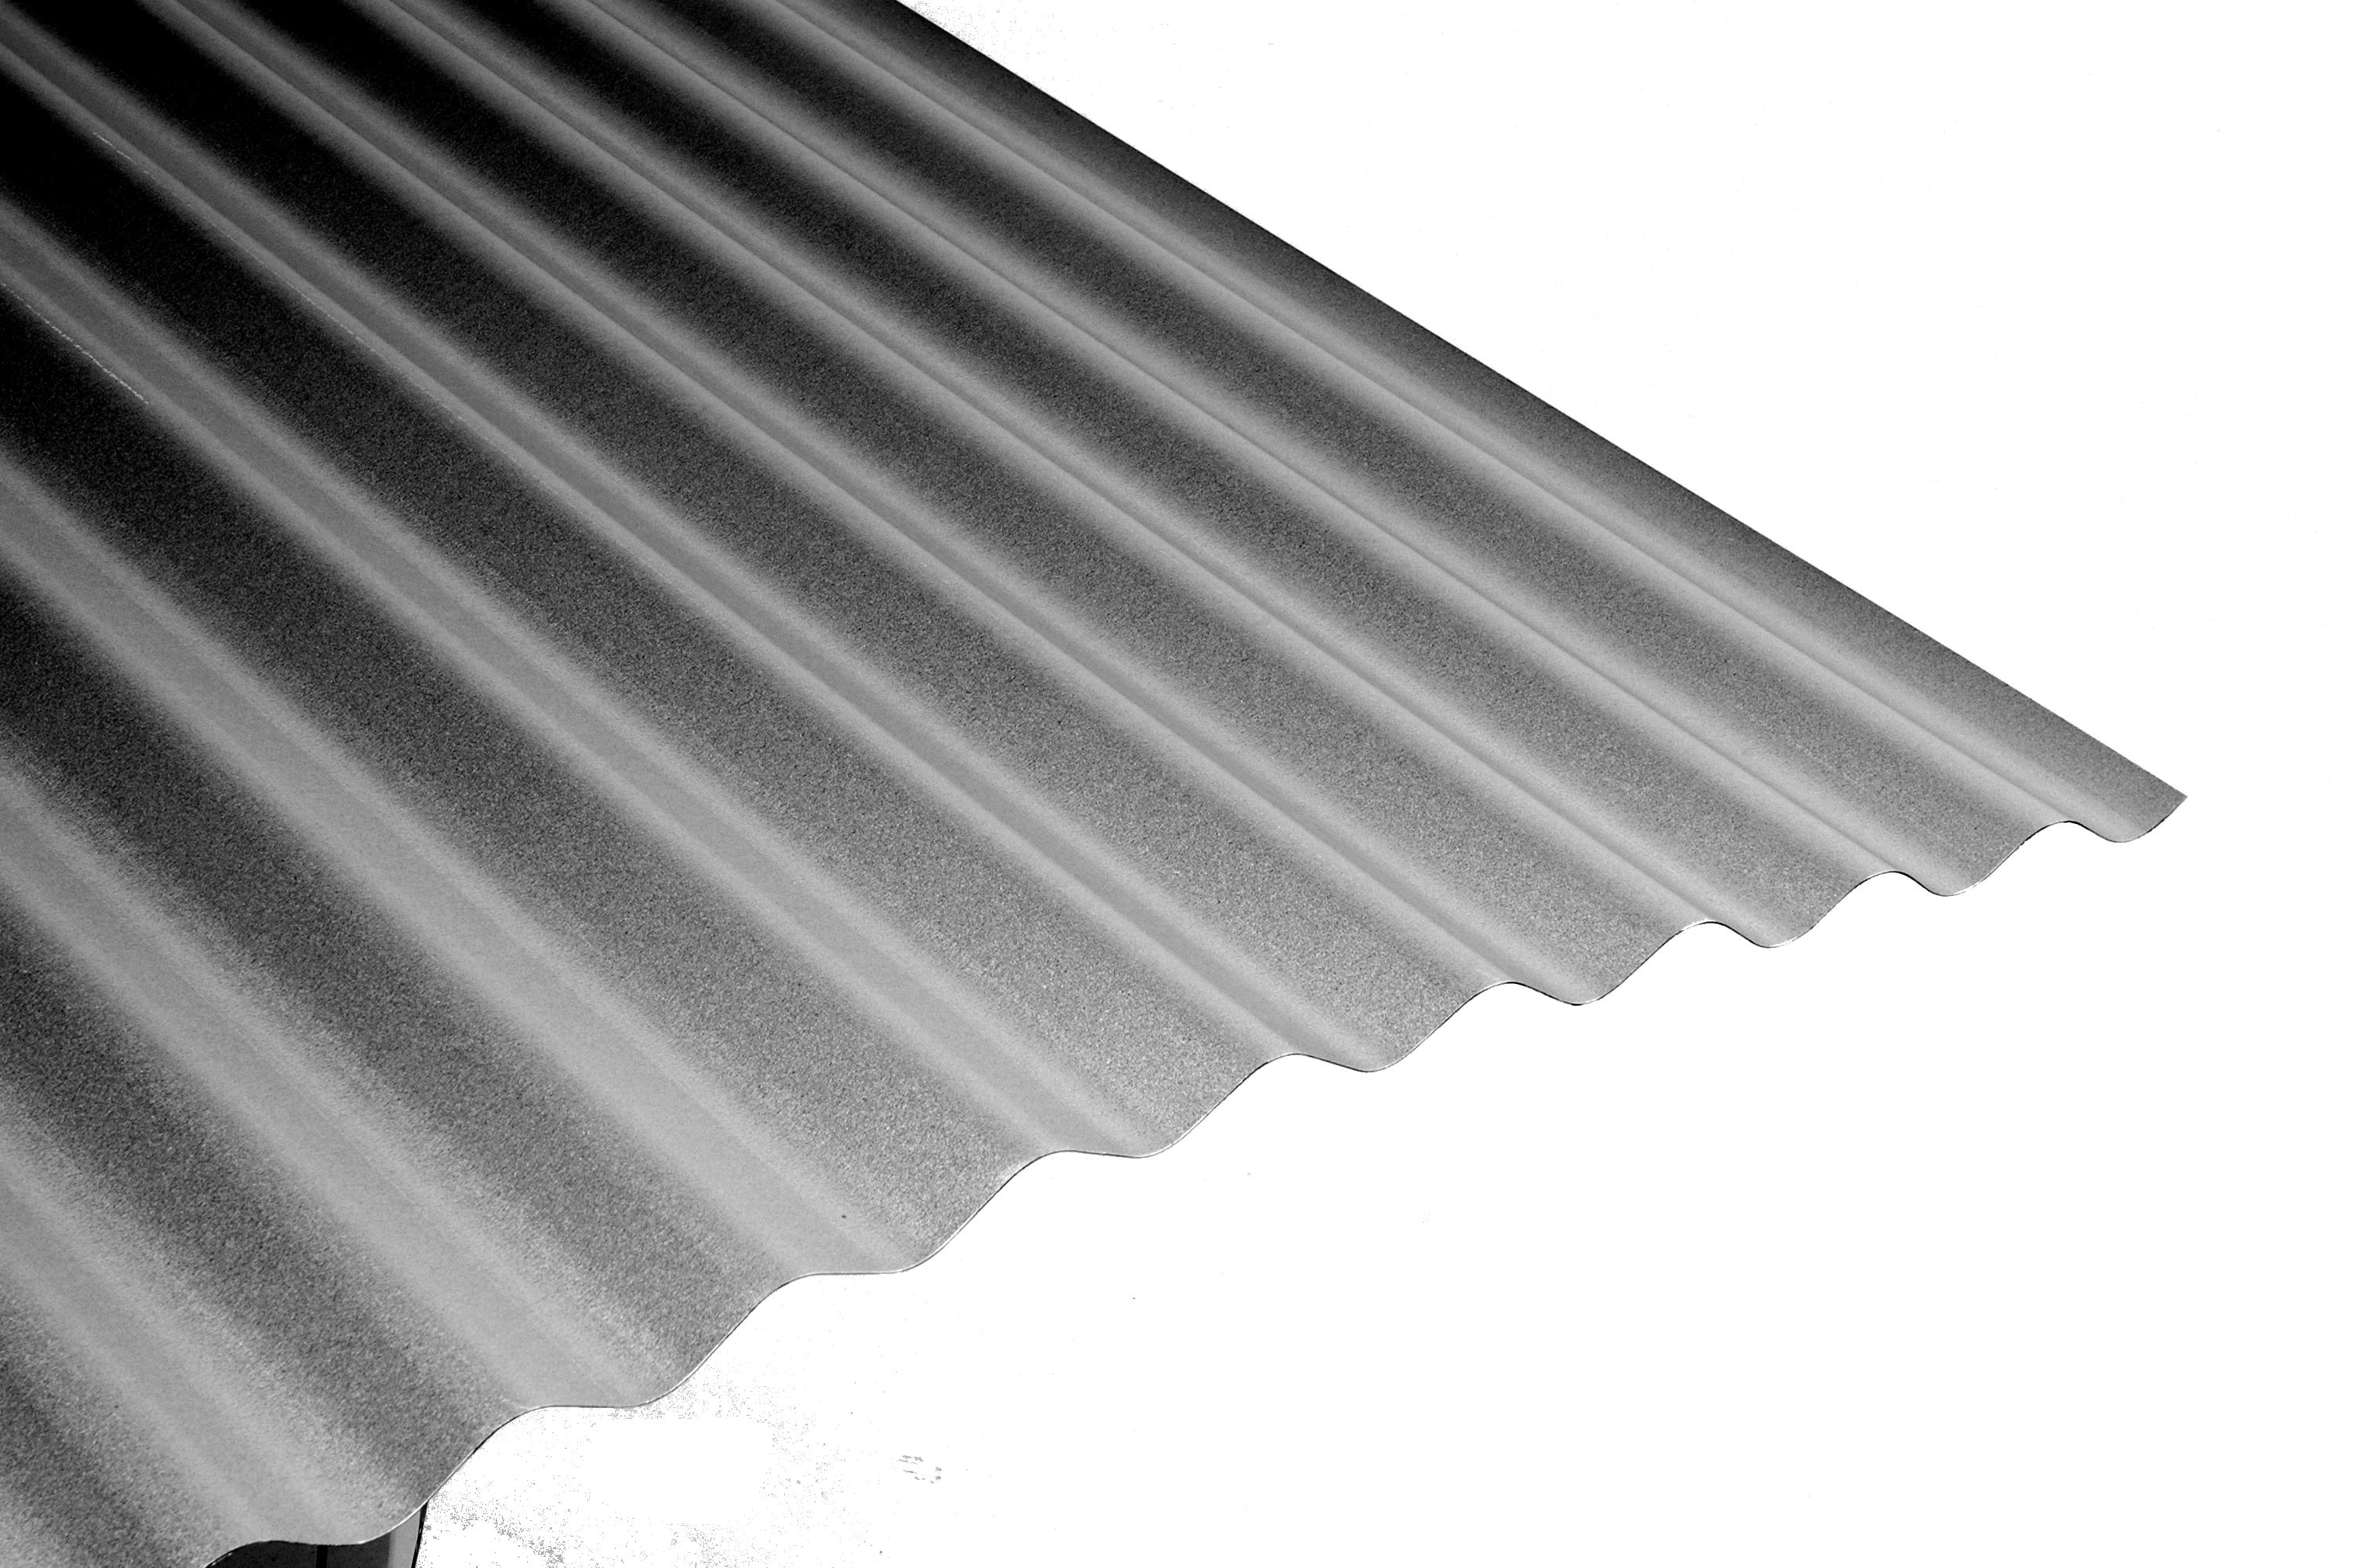 Corrugated Iron Galvanised Corrugated Iron Roofing Sheets